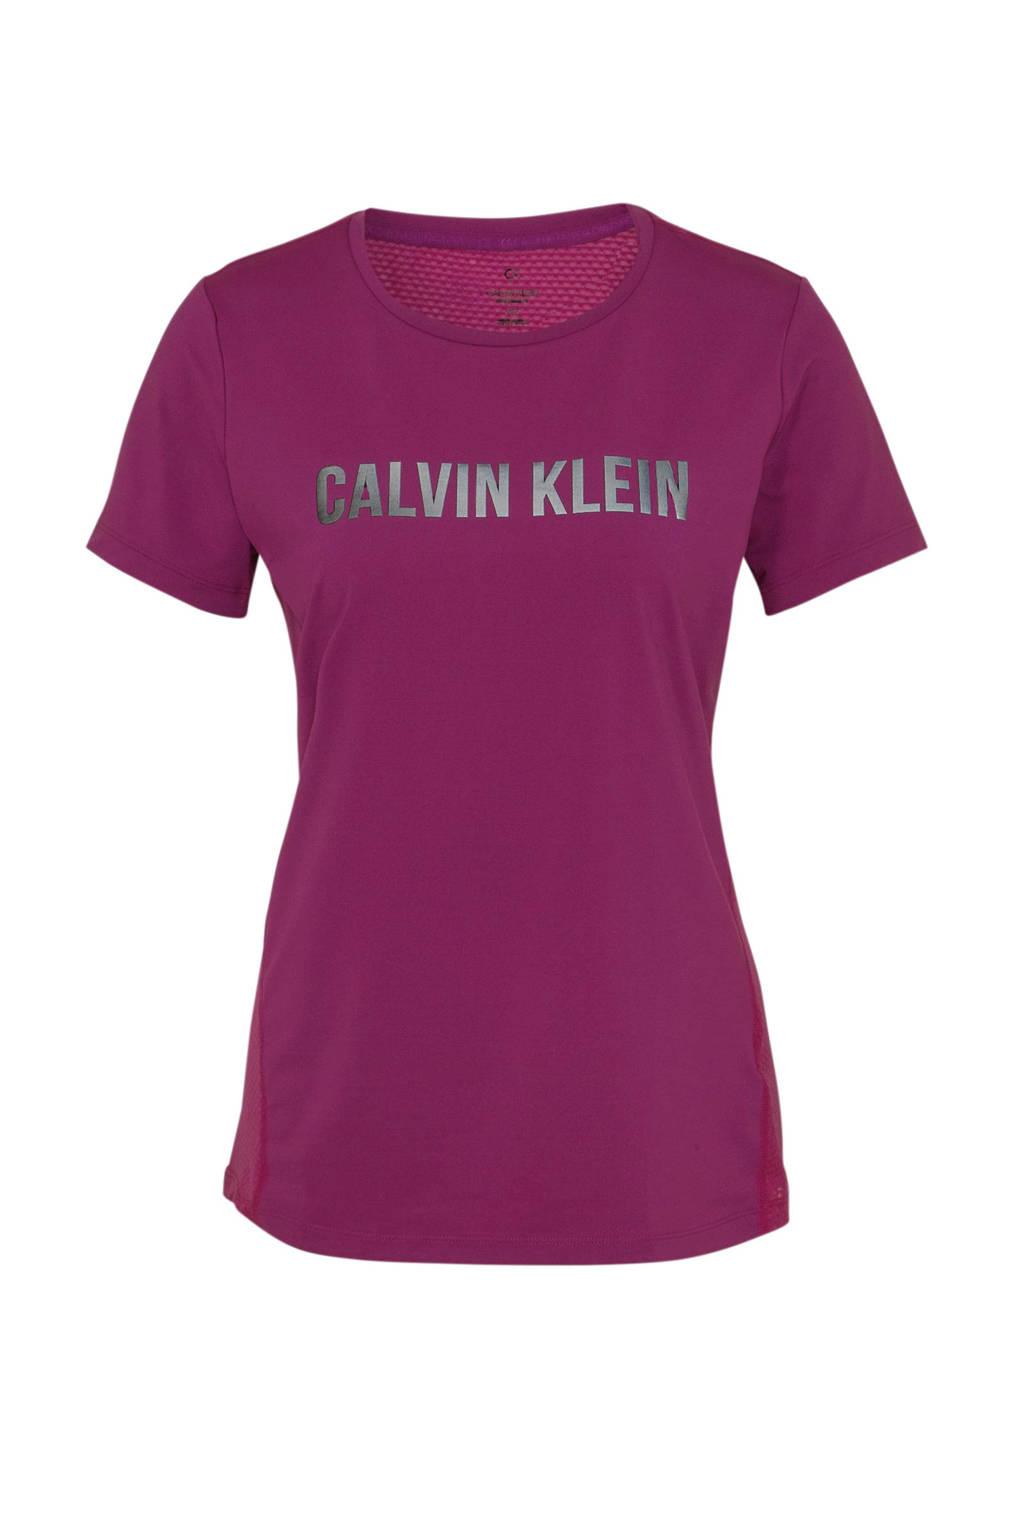 CALVIN KLEIN PERFORMANCE sport T-shirt paars, Paars